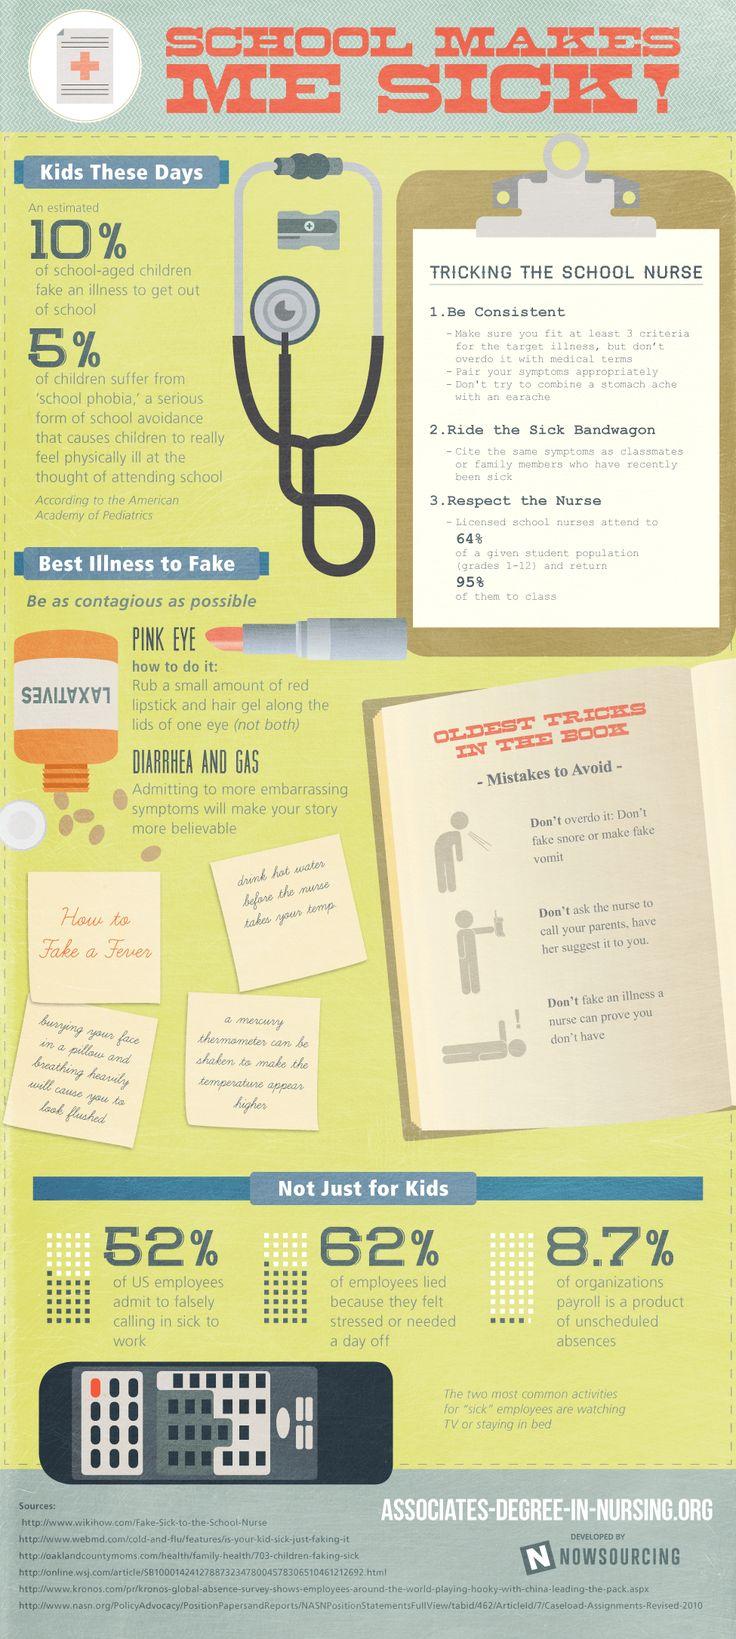 School makes me sick infographic via business2community com